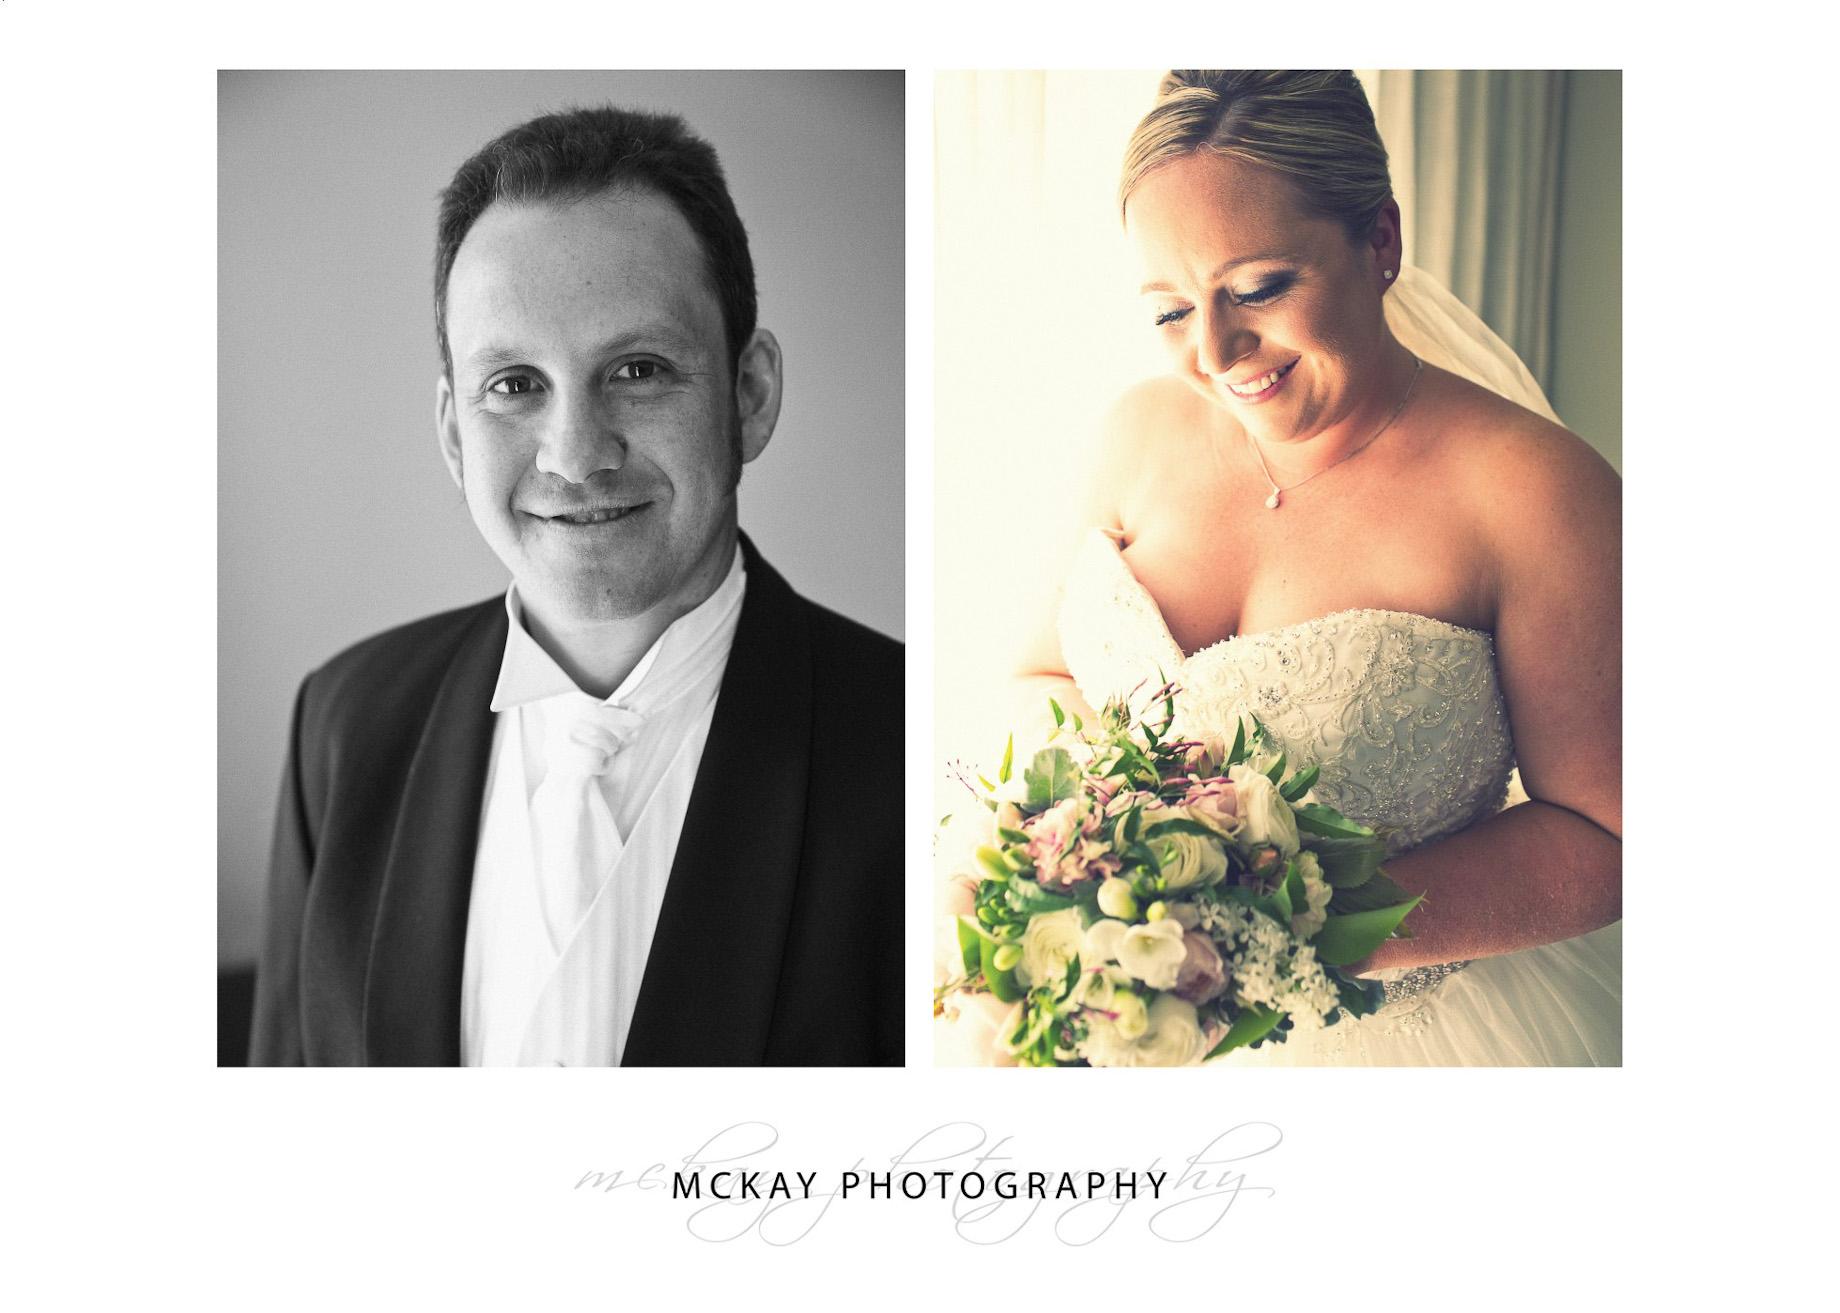 Bride and groom portrait photos